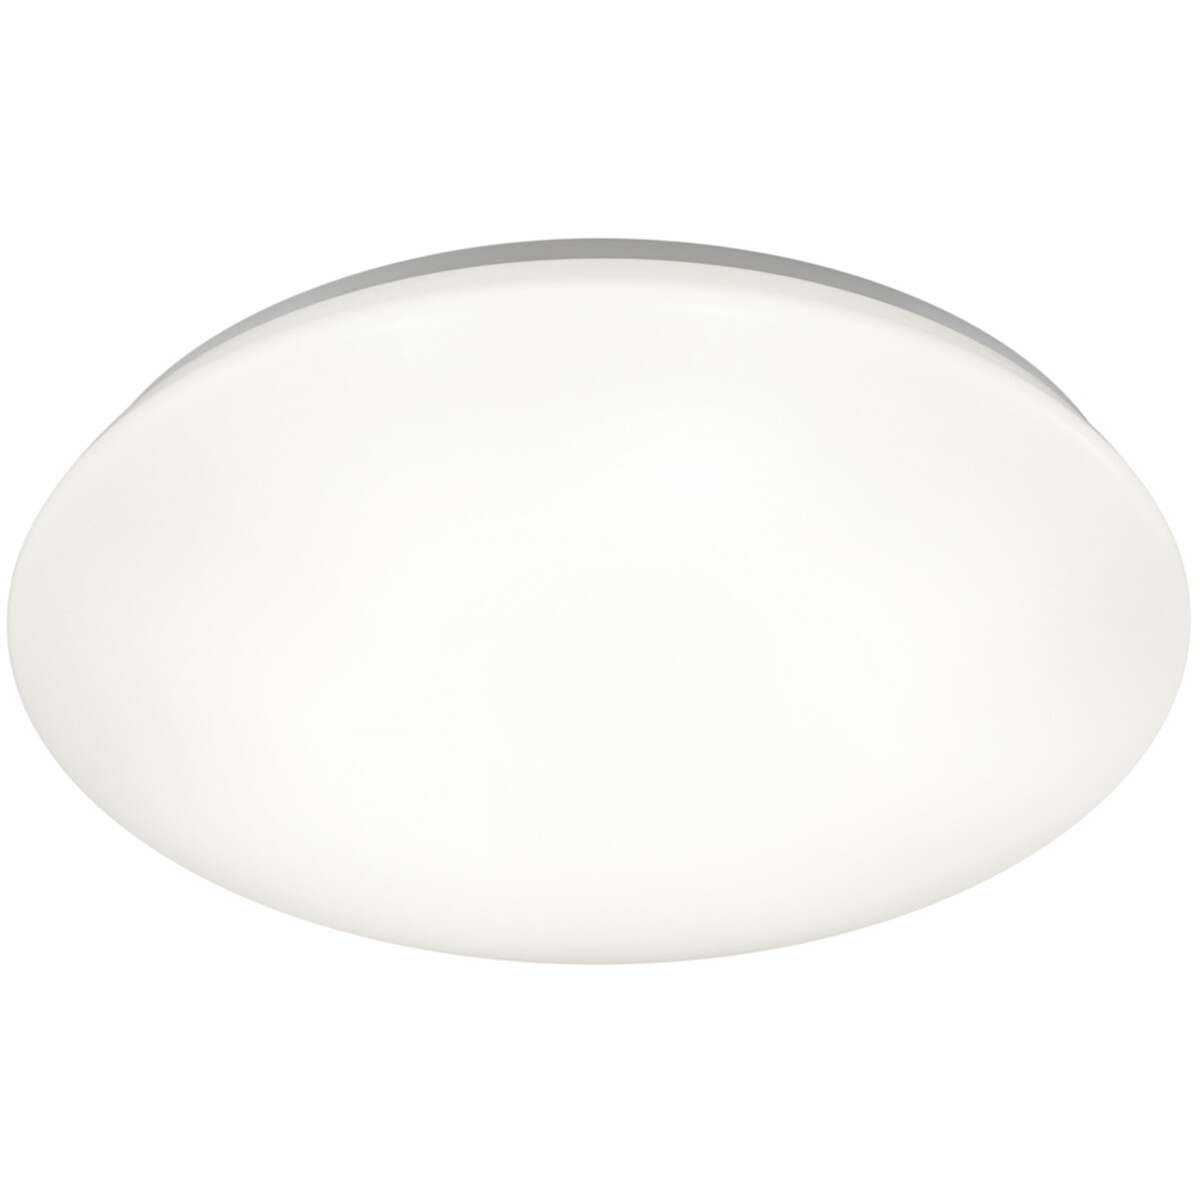 LED Plafondlamp - Trion Potino - 21W - Warm Wit 3000K - Dimbaar - Rond - Mat Wit - Kunststof